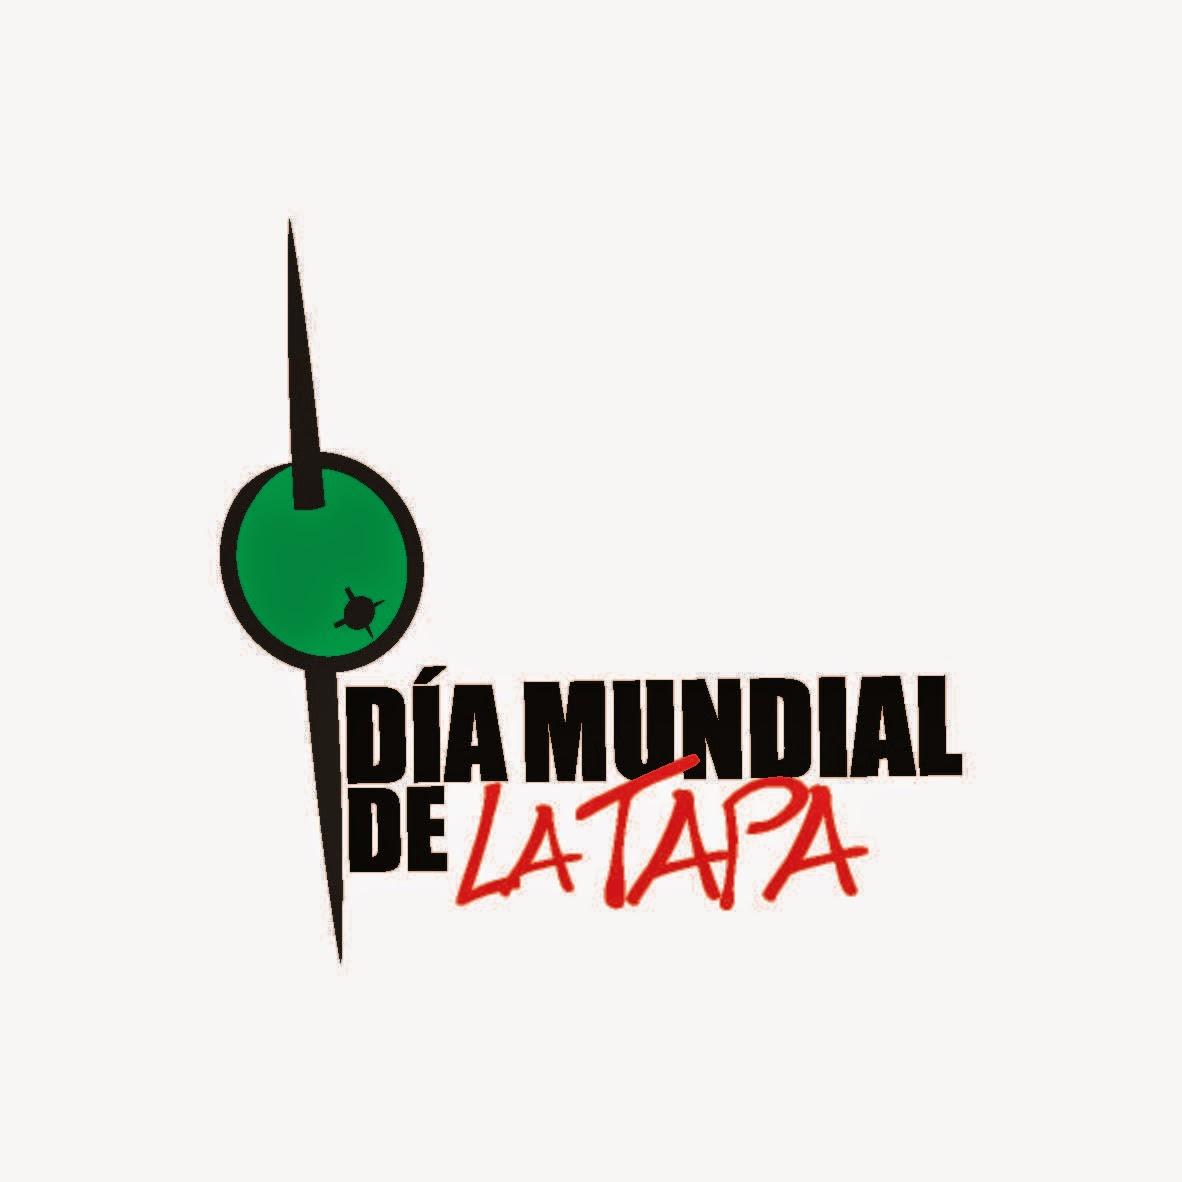 http://www.diamundialdelatapa.es/concurso/concurso.html